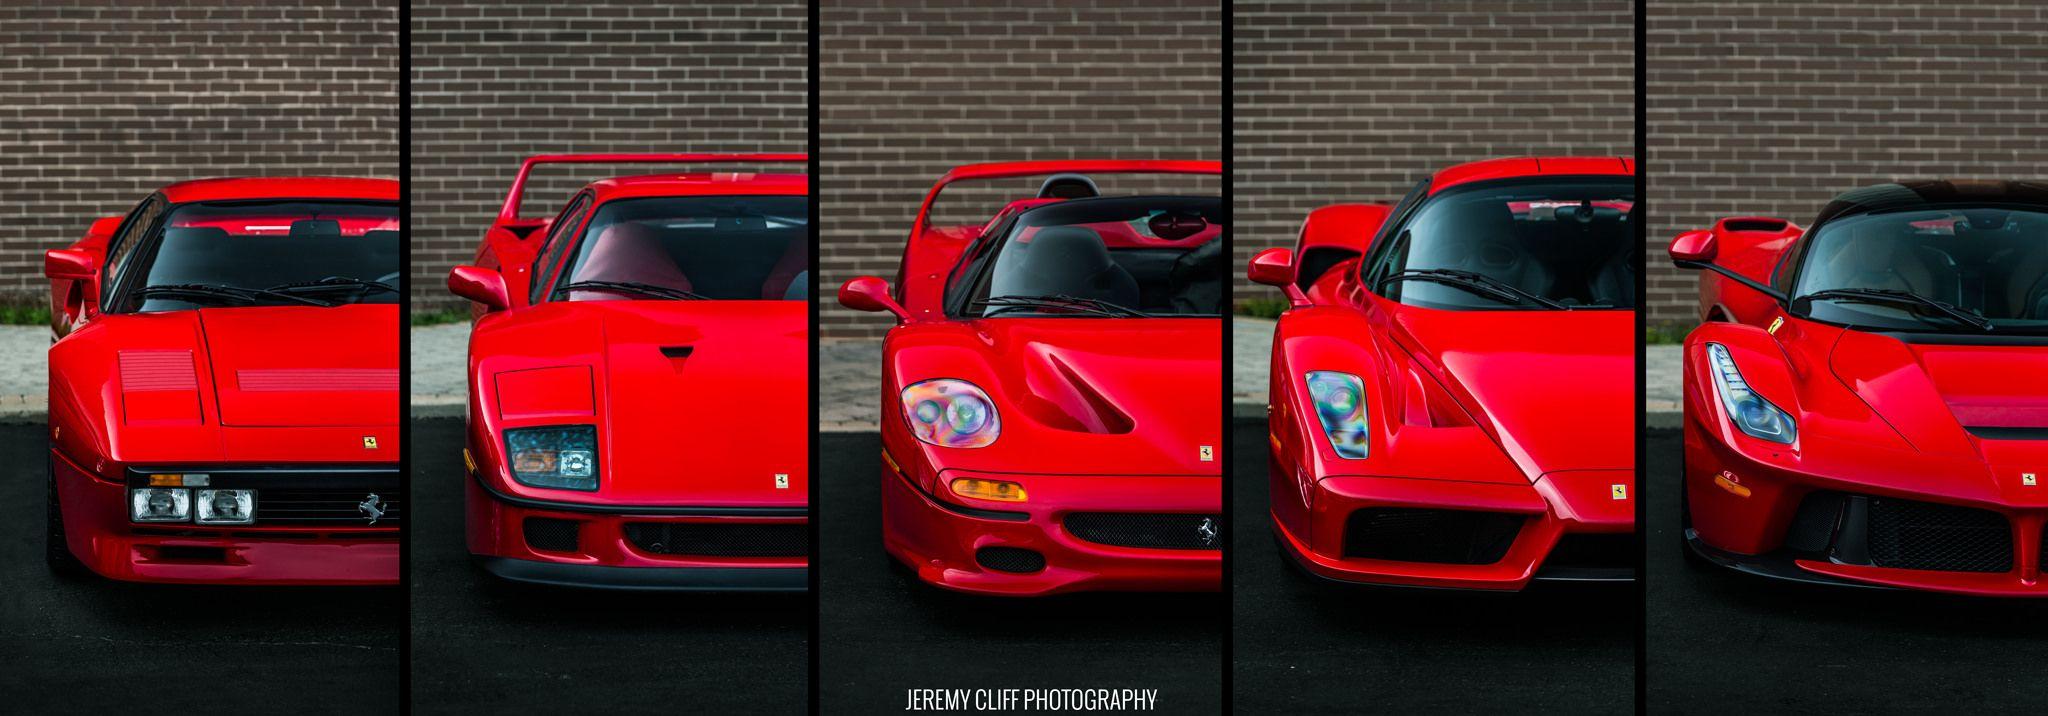 5 Generations Of Ferrari Supercars Ferrari 288 Gto Super Cars Ferrari